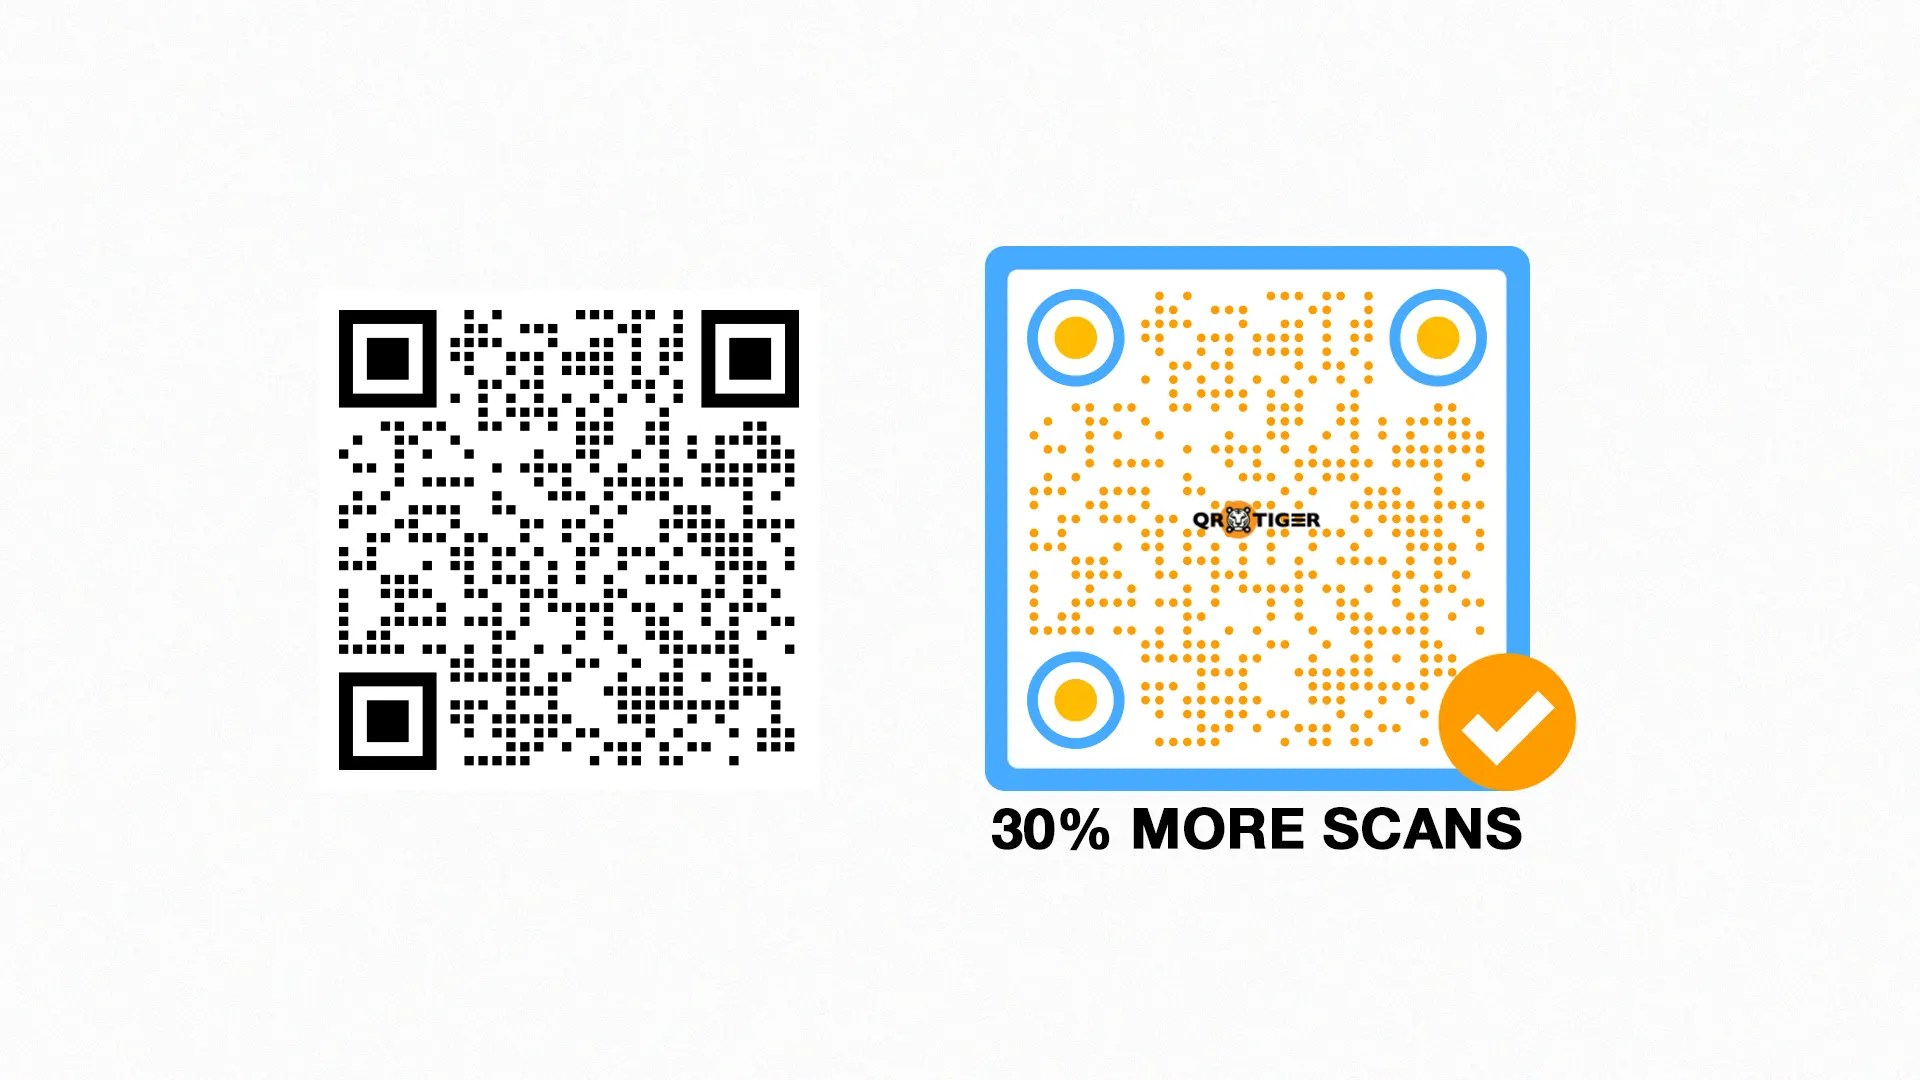 visual qr codes